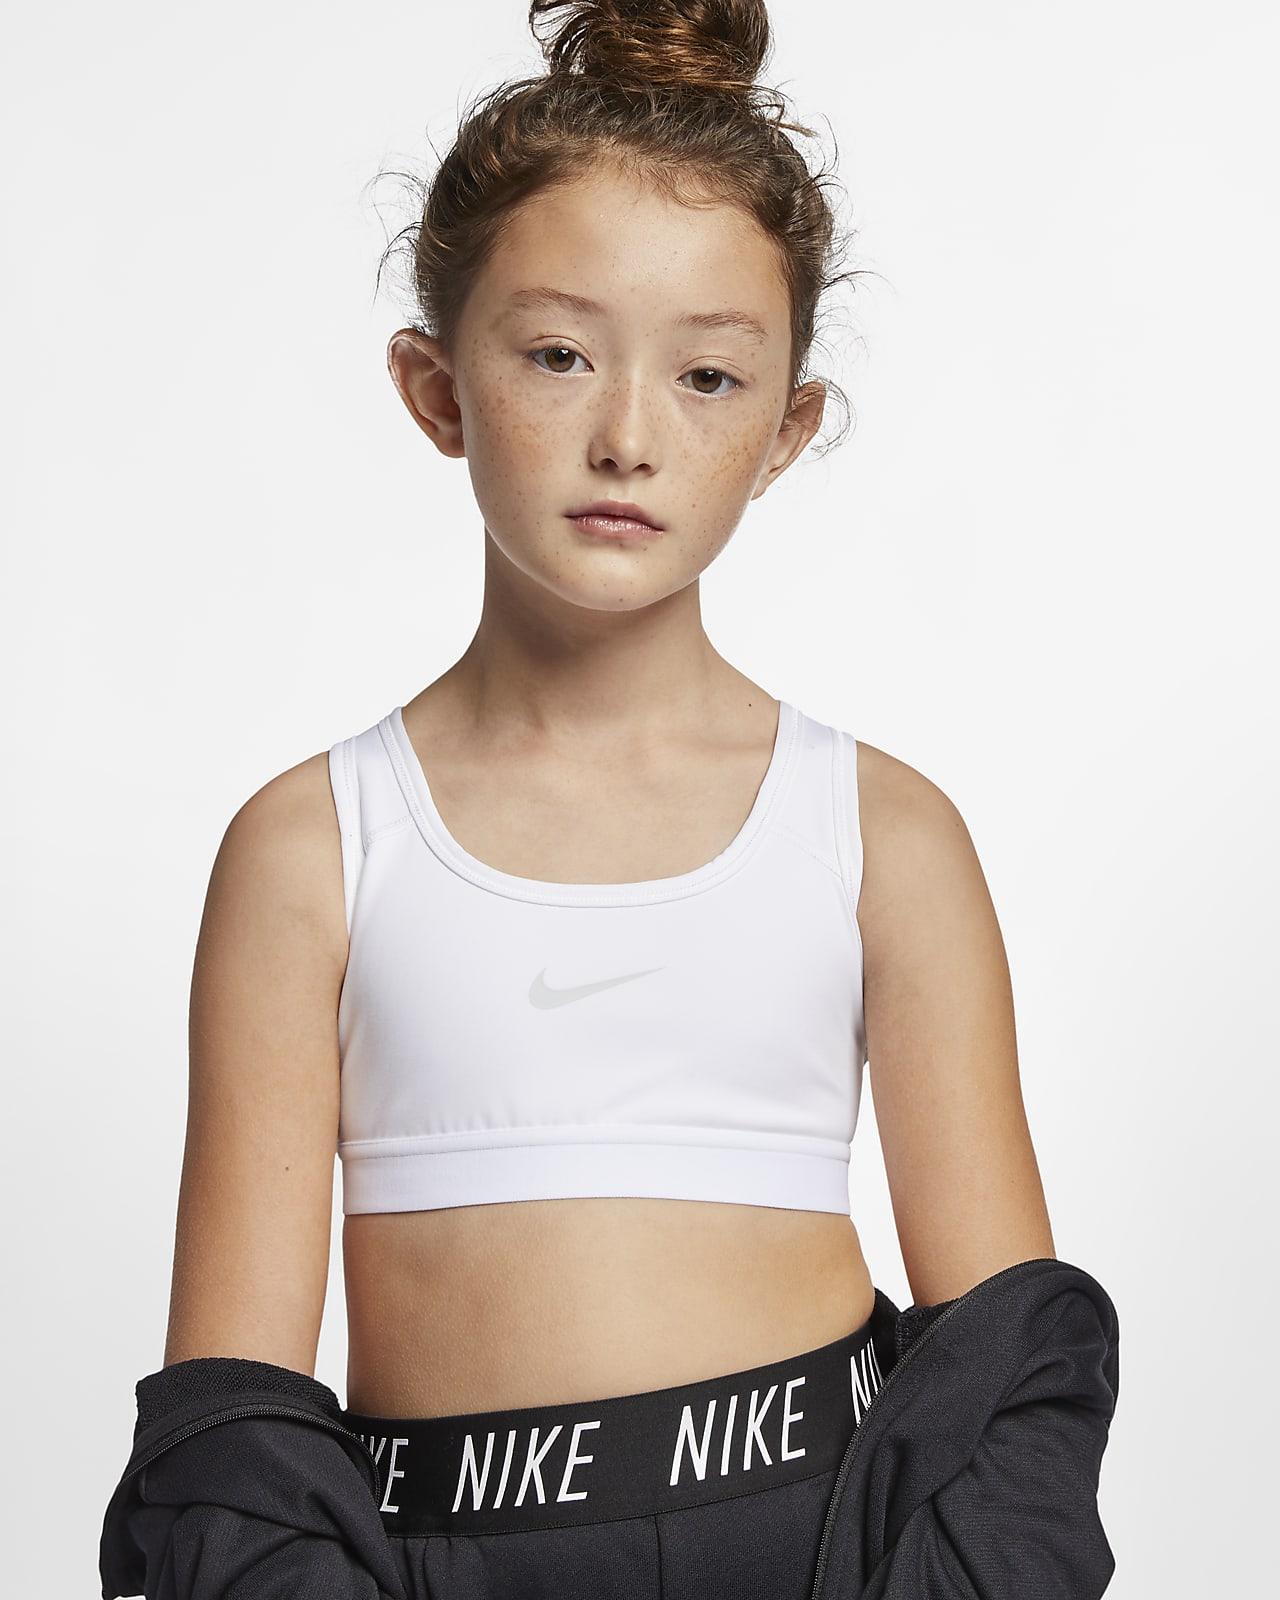 Nike Sostenidors esportius - Nena